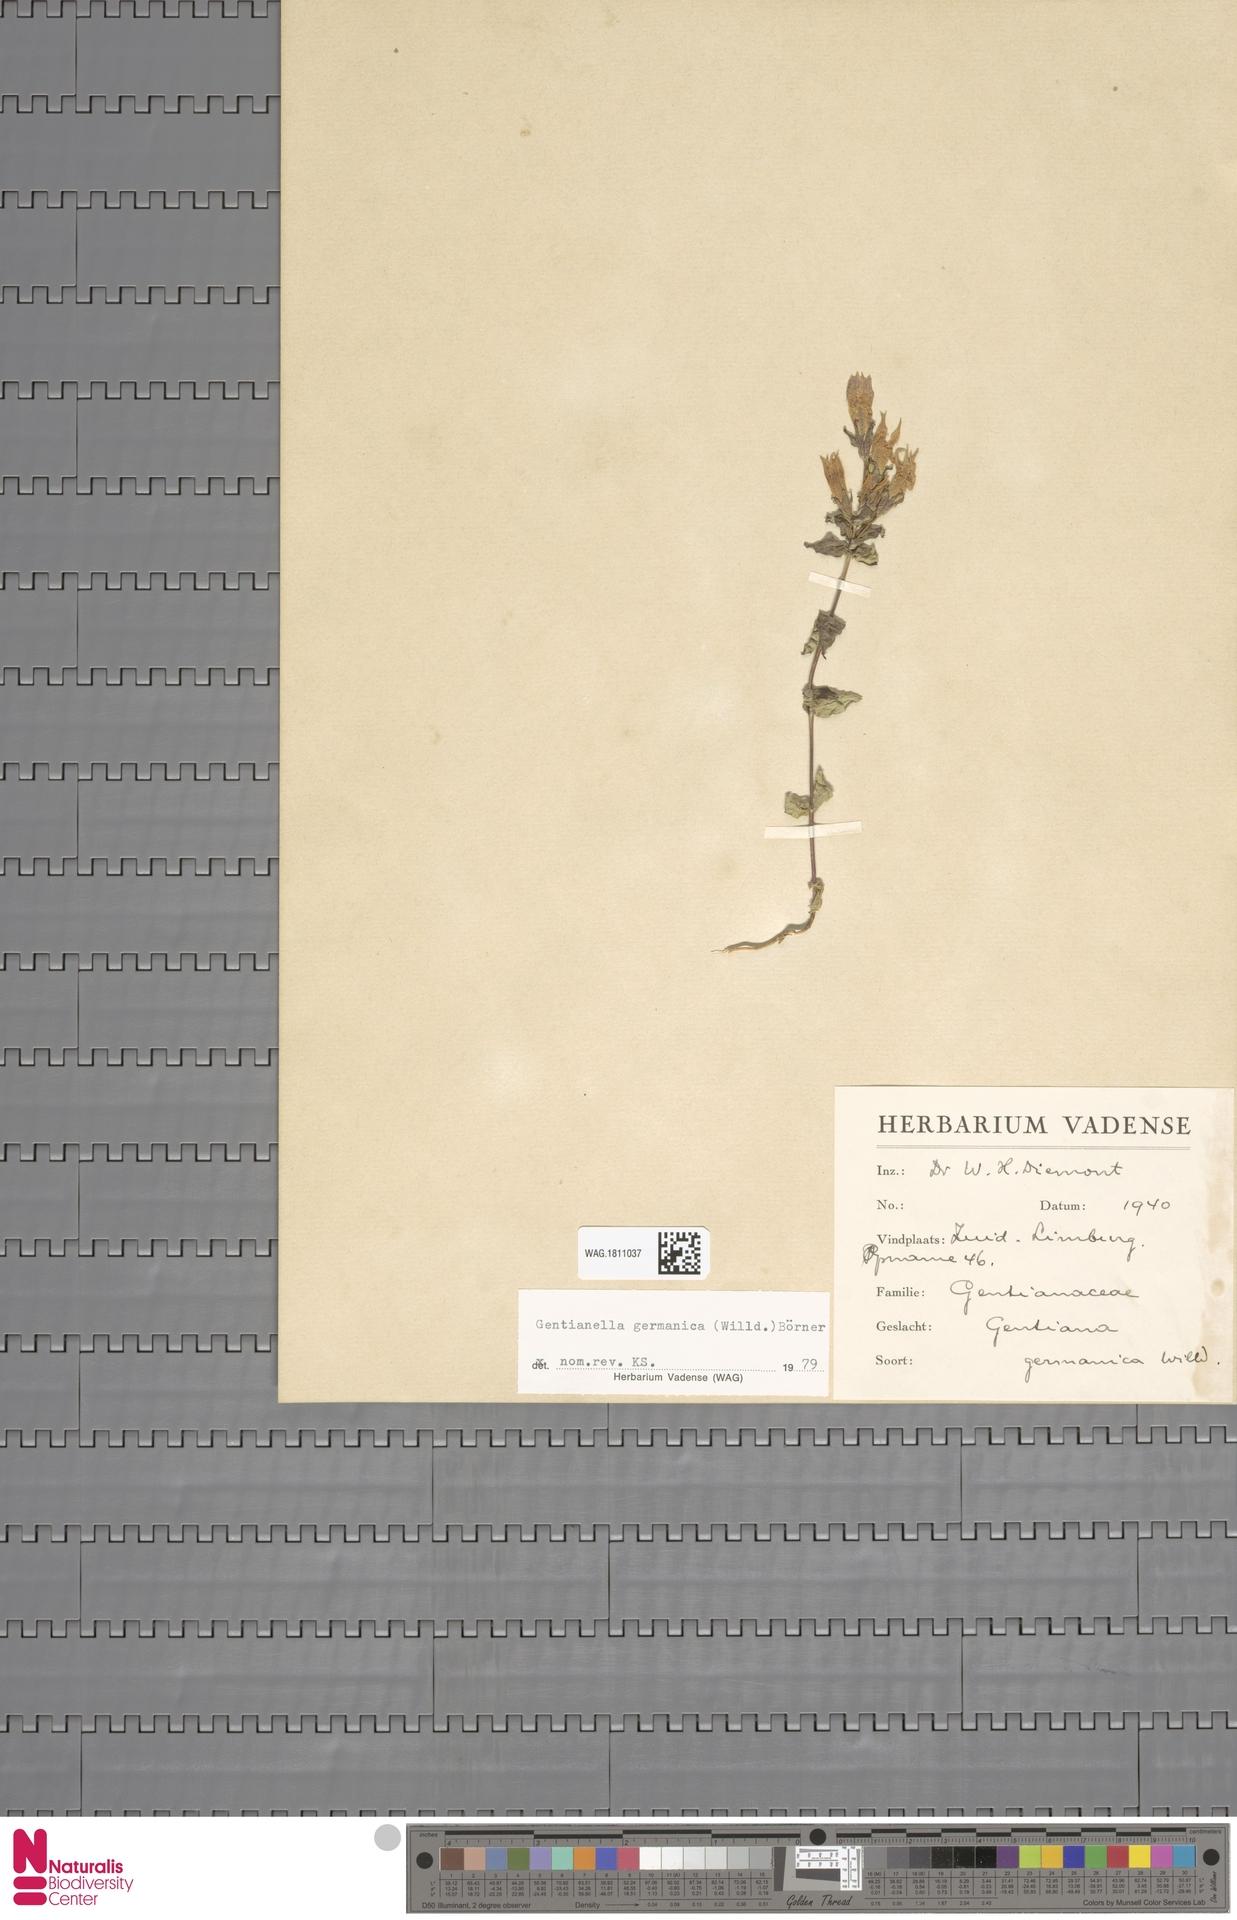 WAG.1811037 | Gentianella germanica (Willd.) E.F.Warb.